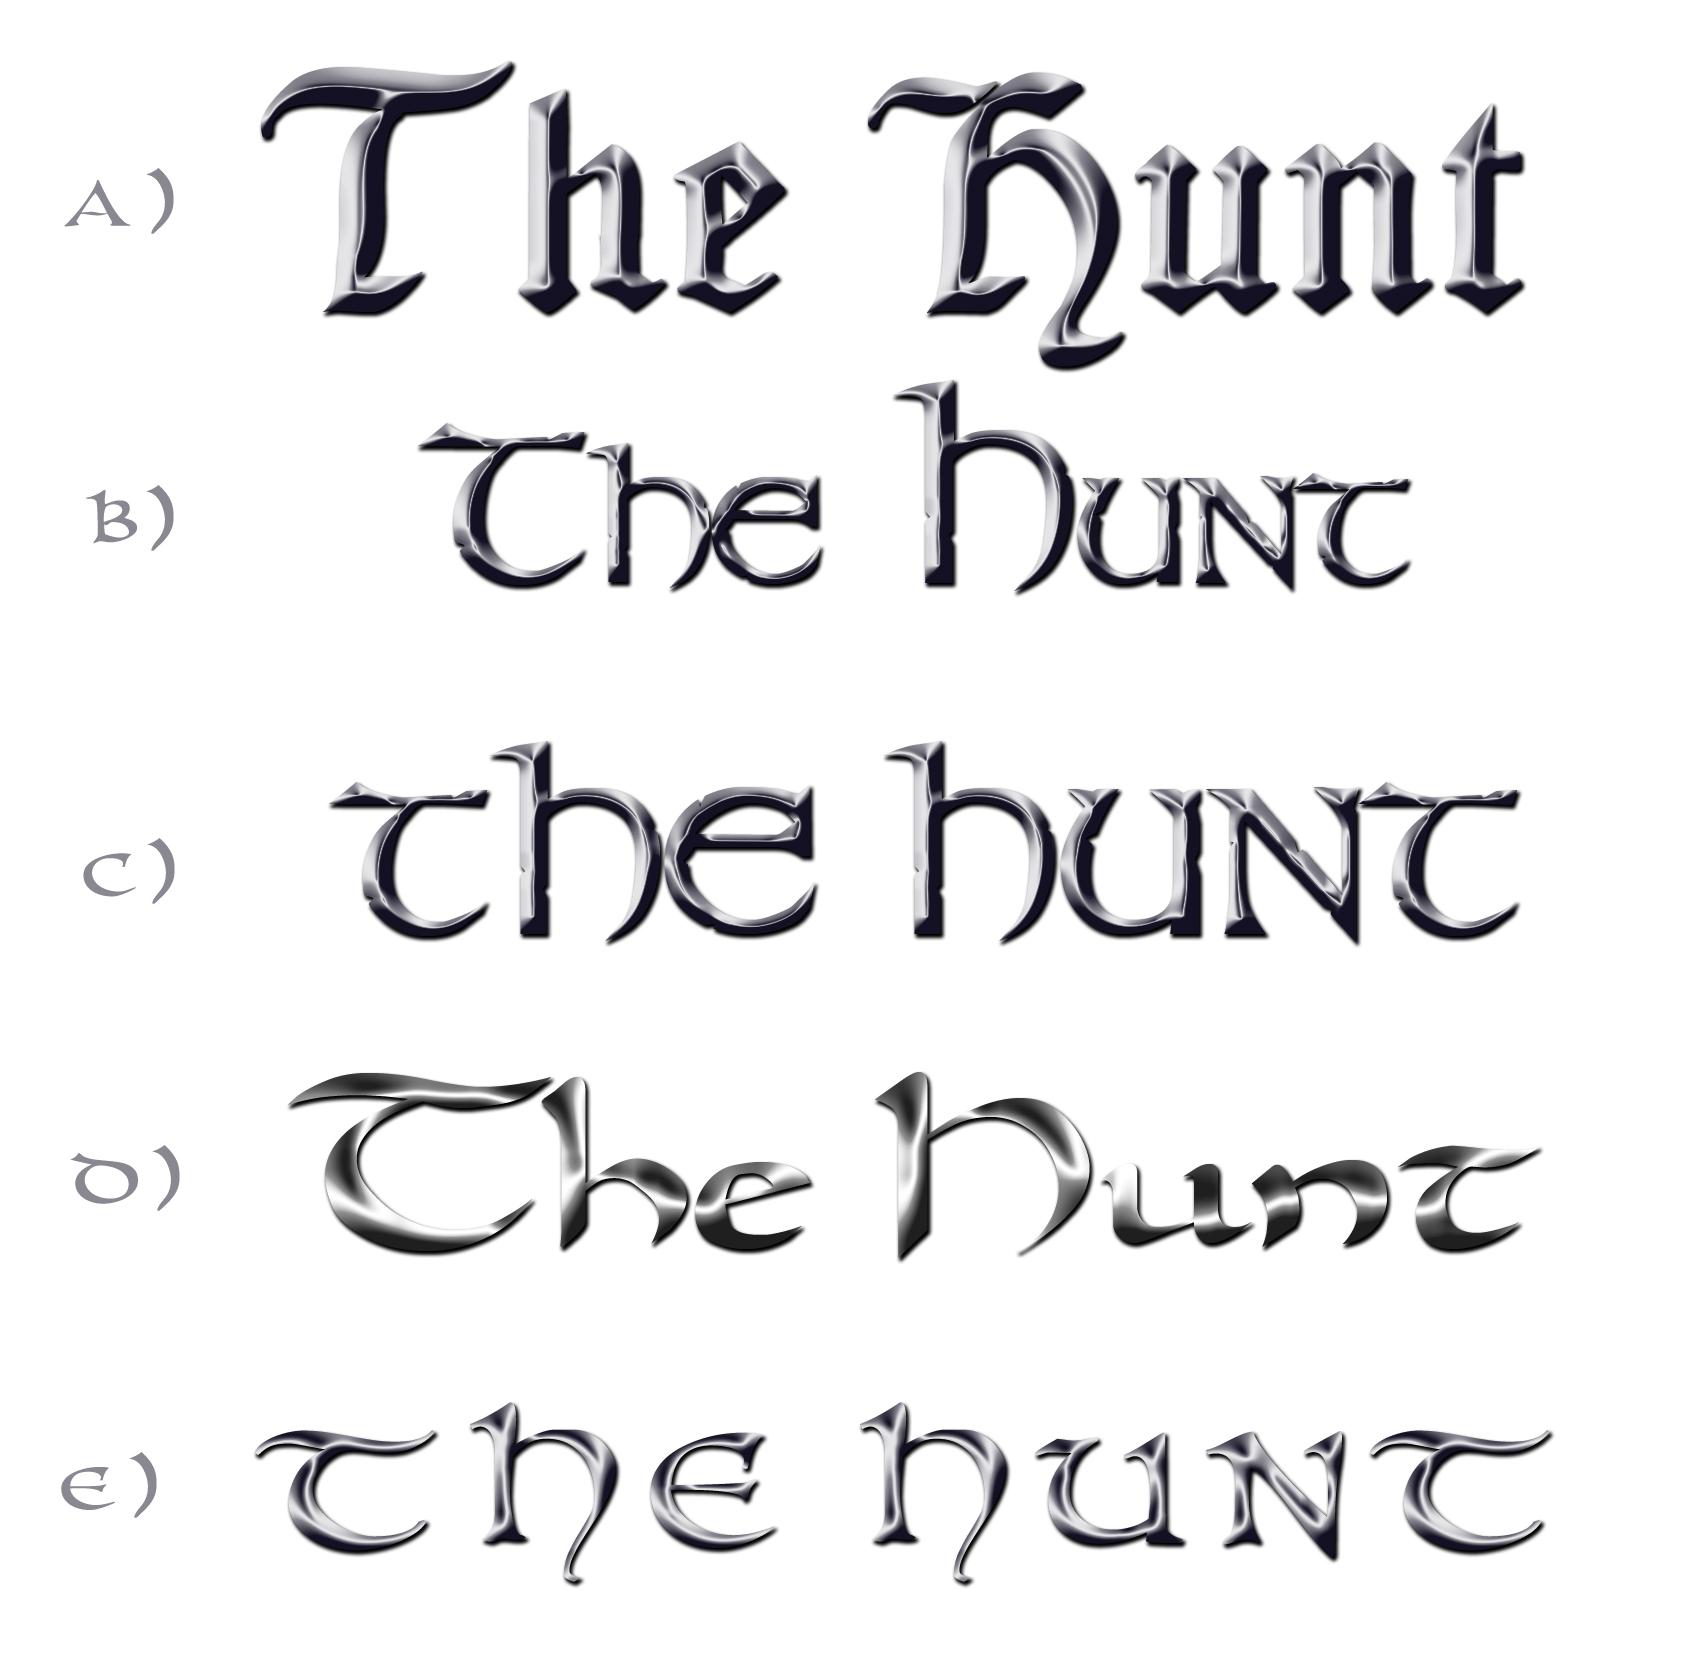 Hunt - Previa/Wip. - Página 3 The_hunt___logo_test_copy_by_jp_vilela-d6f8owq